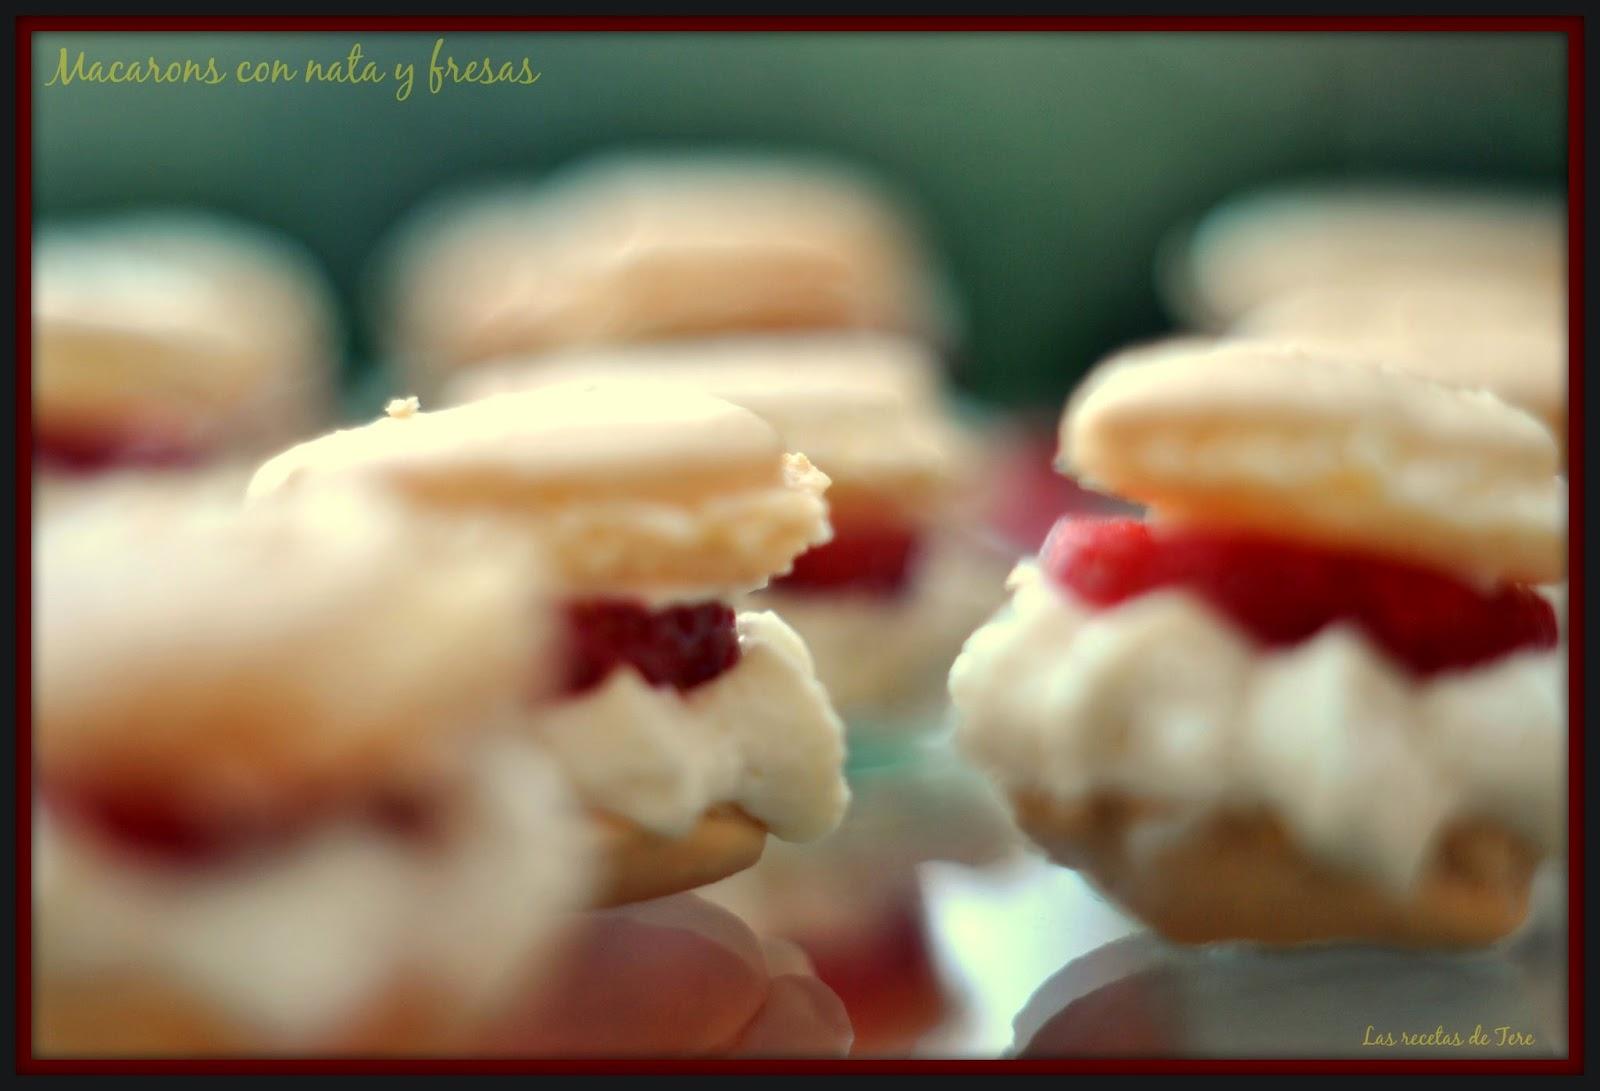 Macarons con nata y fresas 03